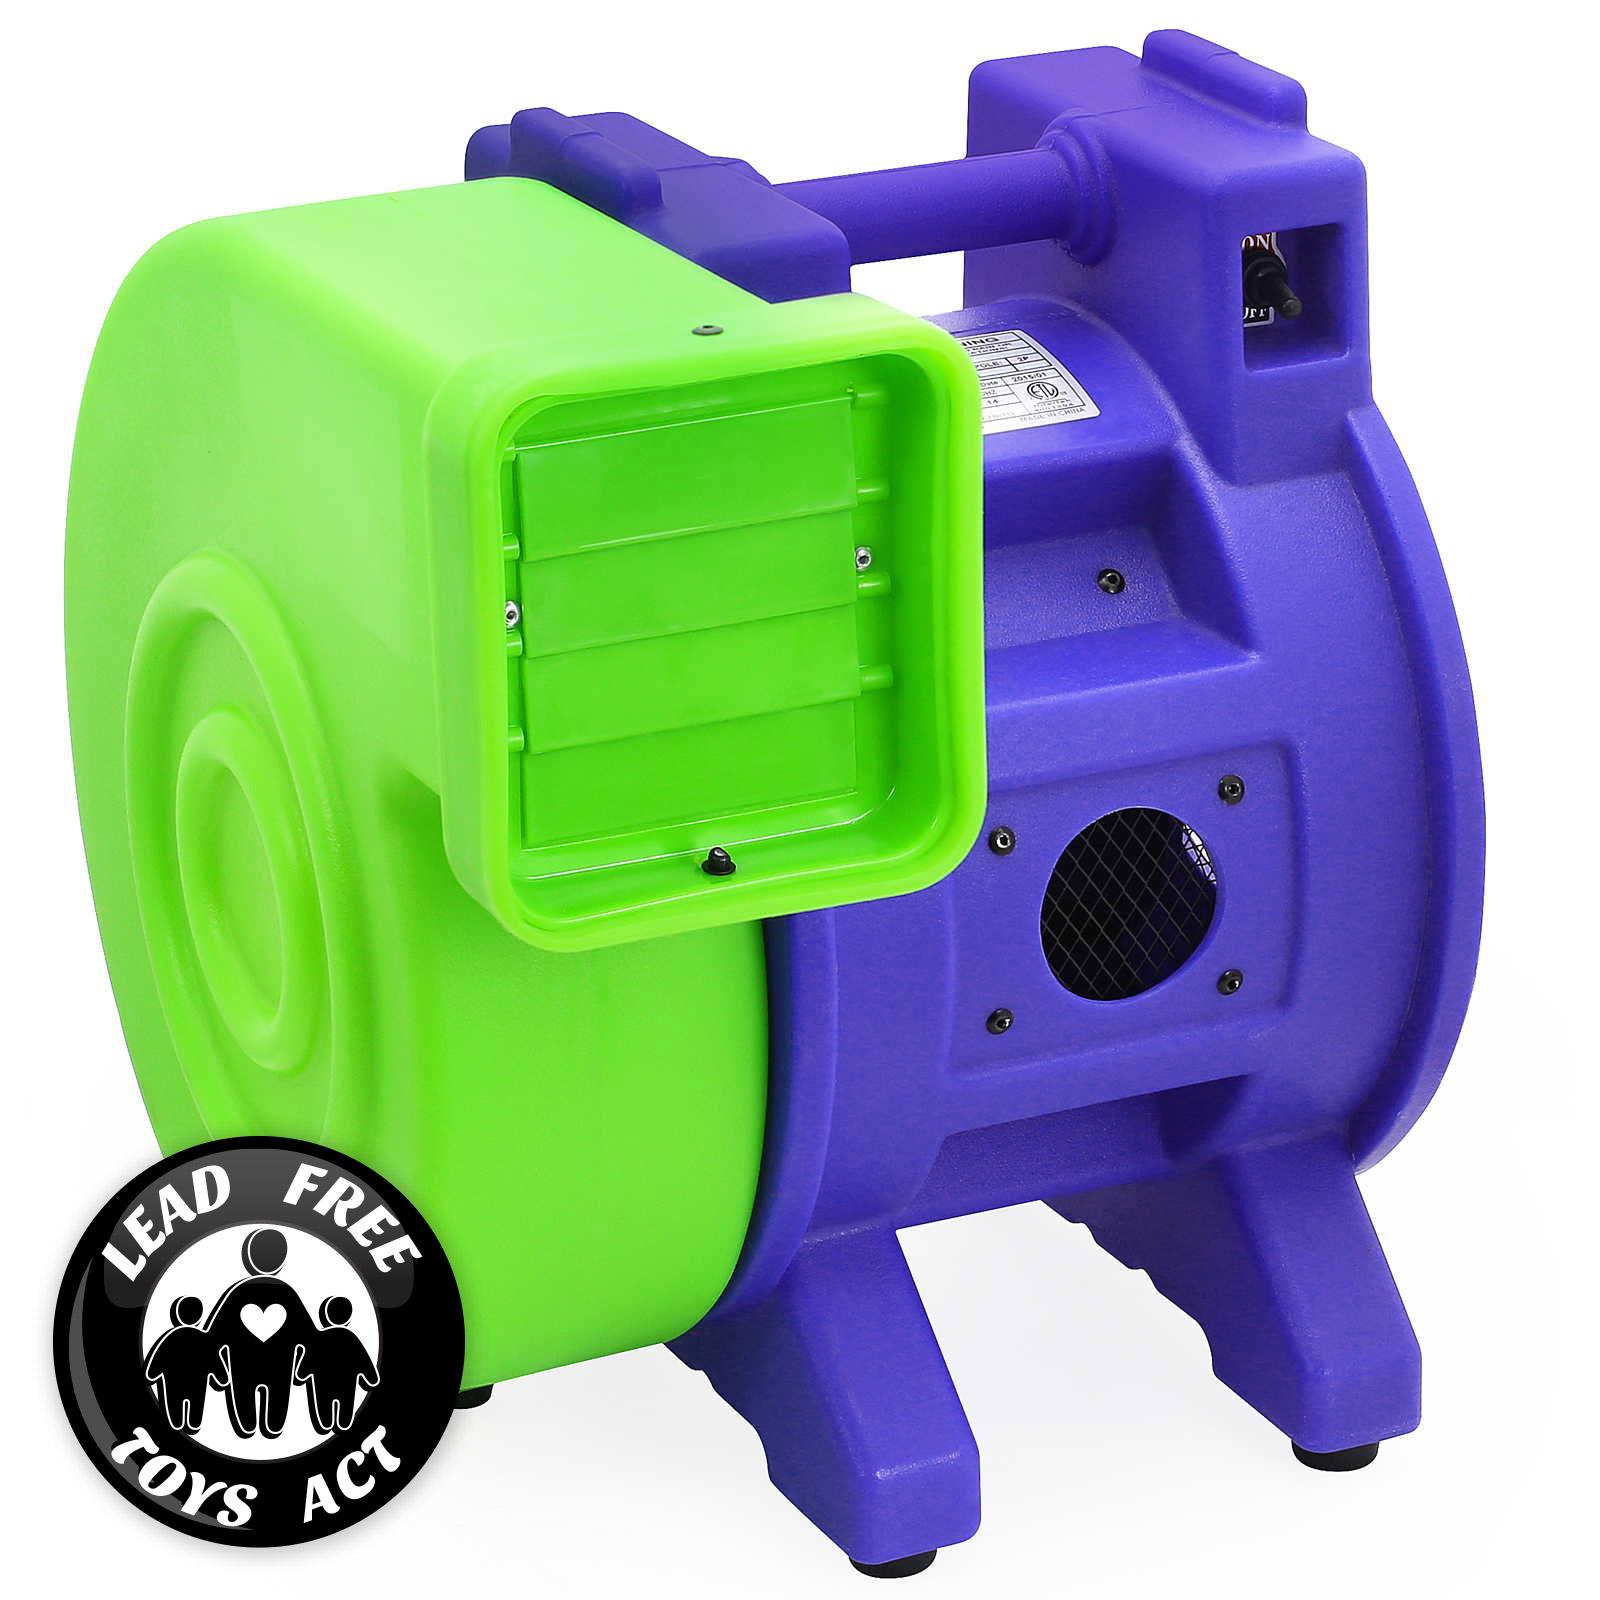 Blower Air Pump : Commercial inflatable bounce house air pump blower fan